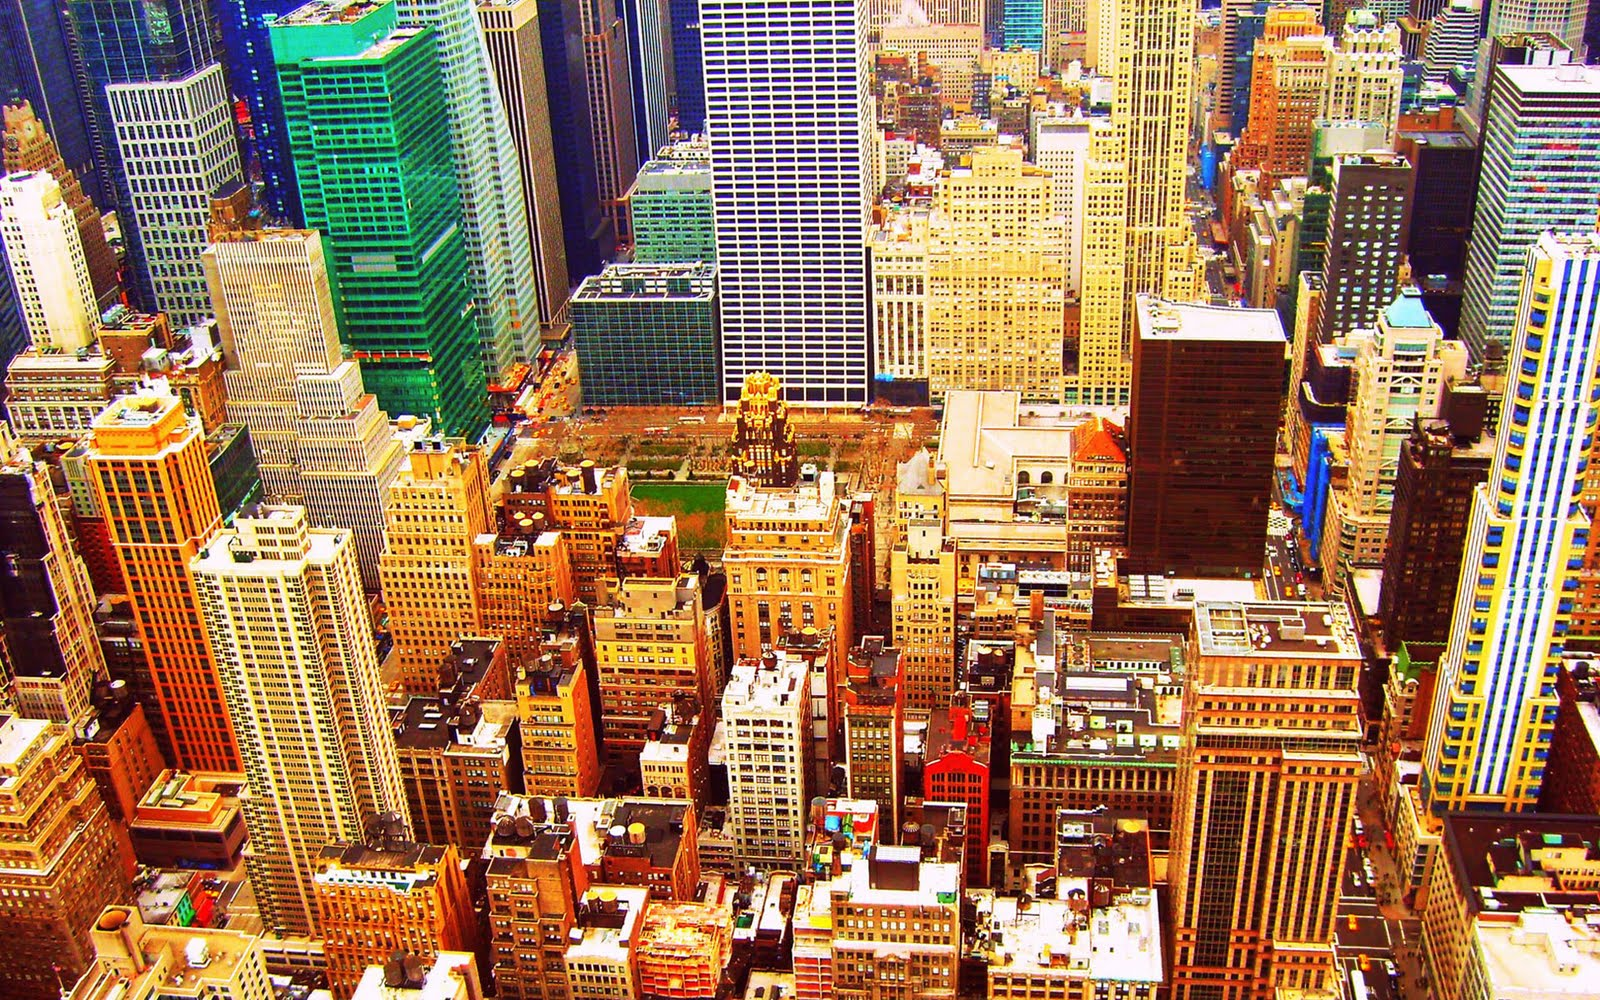 http://4.bp.blogspot.com/-891Gp2J1moA/TjuU3hXcN5I/AAAAAAAANU8/MsvqPiQeL6I/s1600/America-New-York-Skyscrapers-Wallpaper.jpg